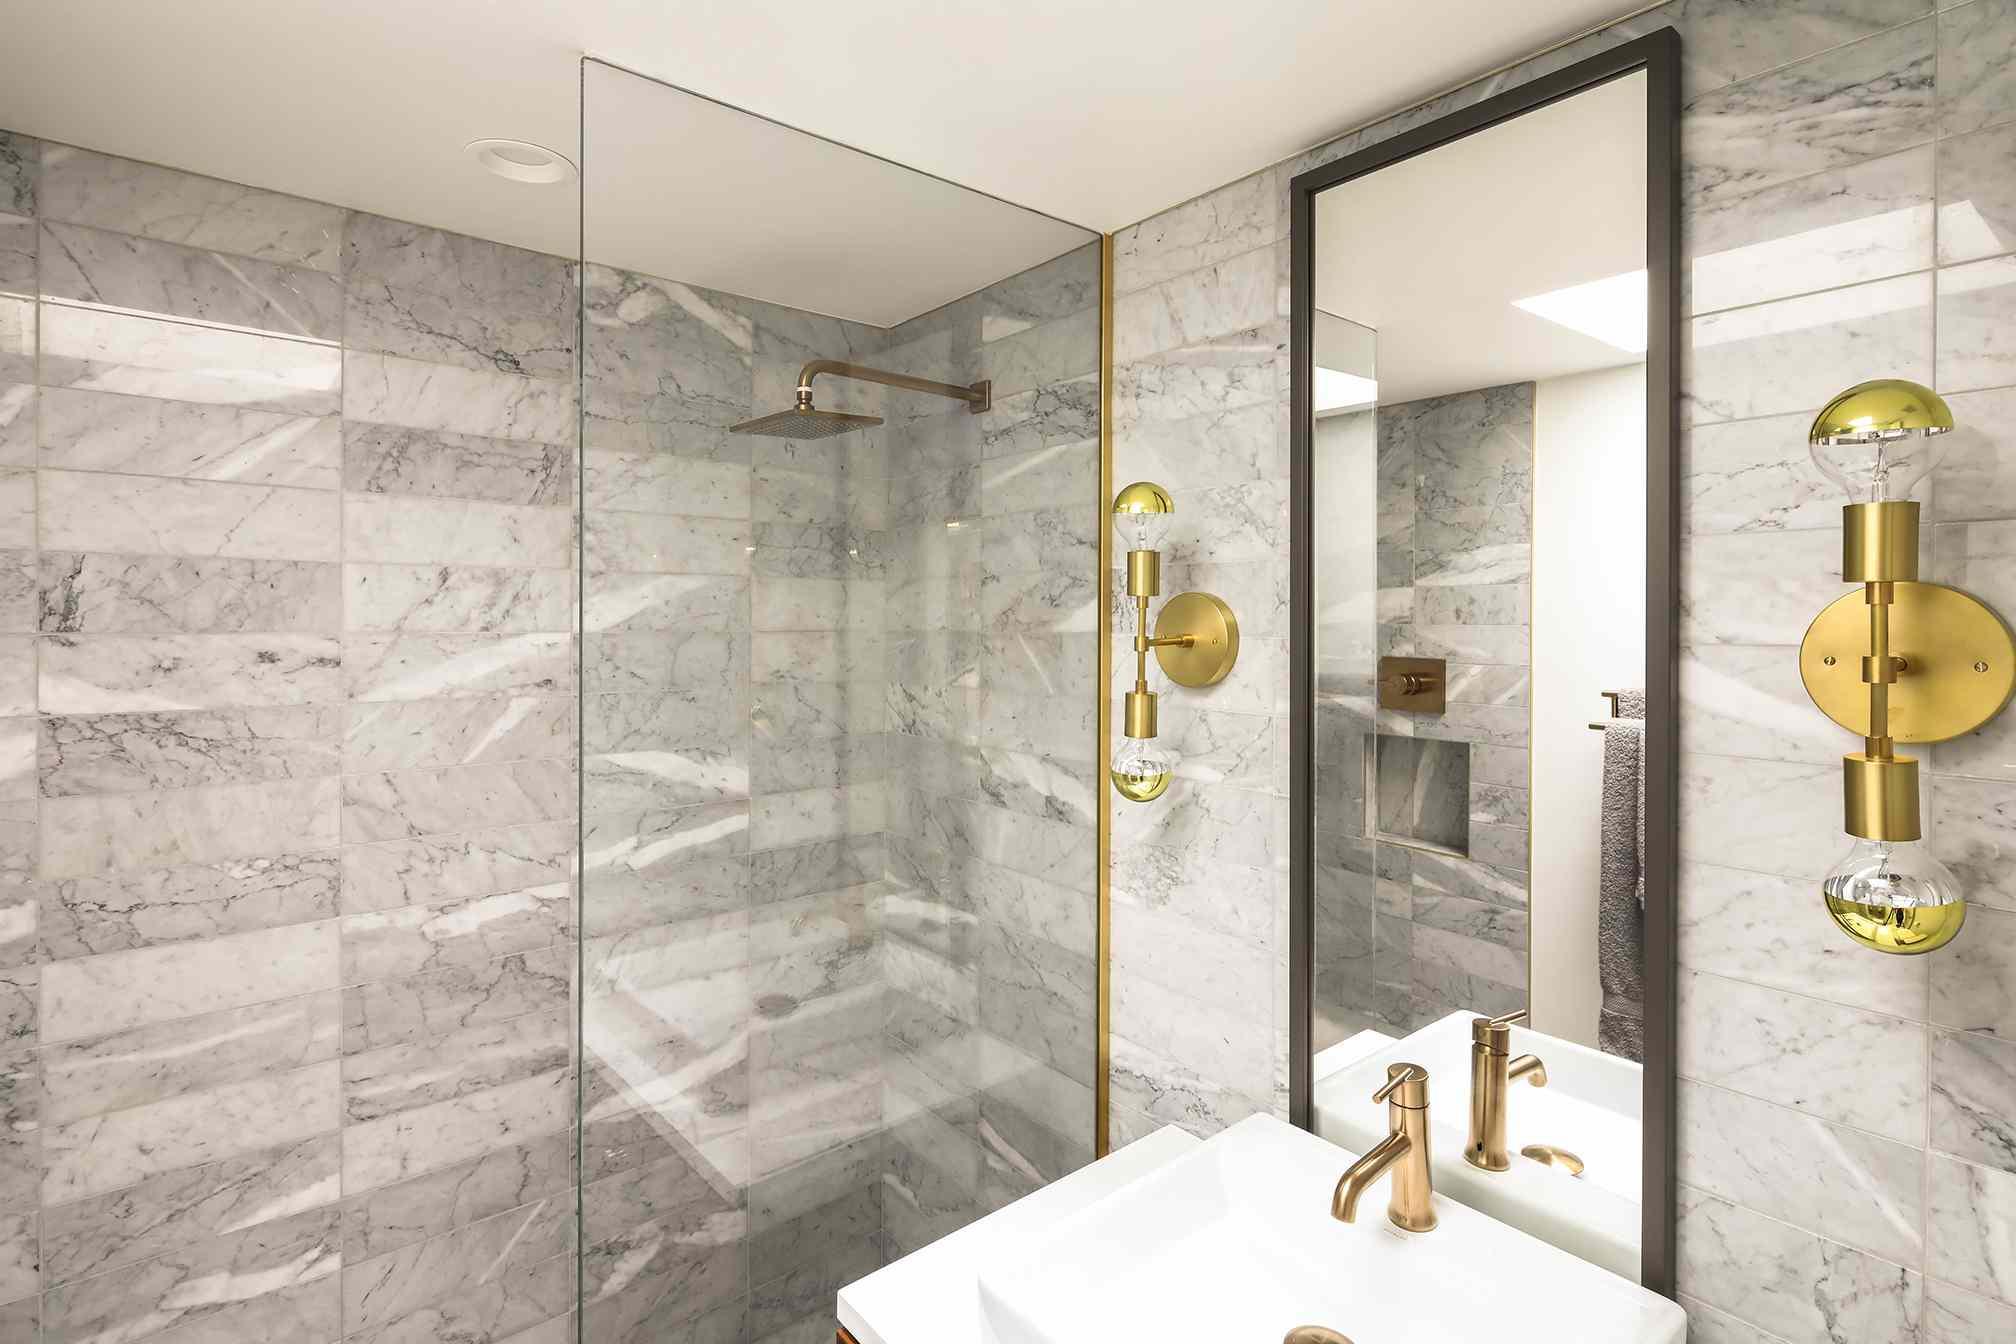 Bathroom with gray tiles